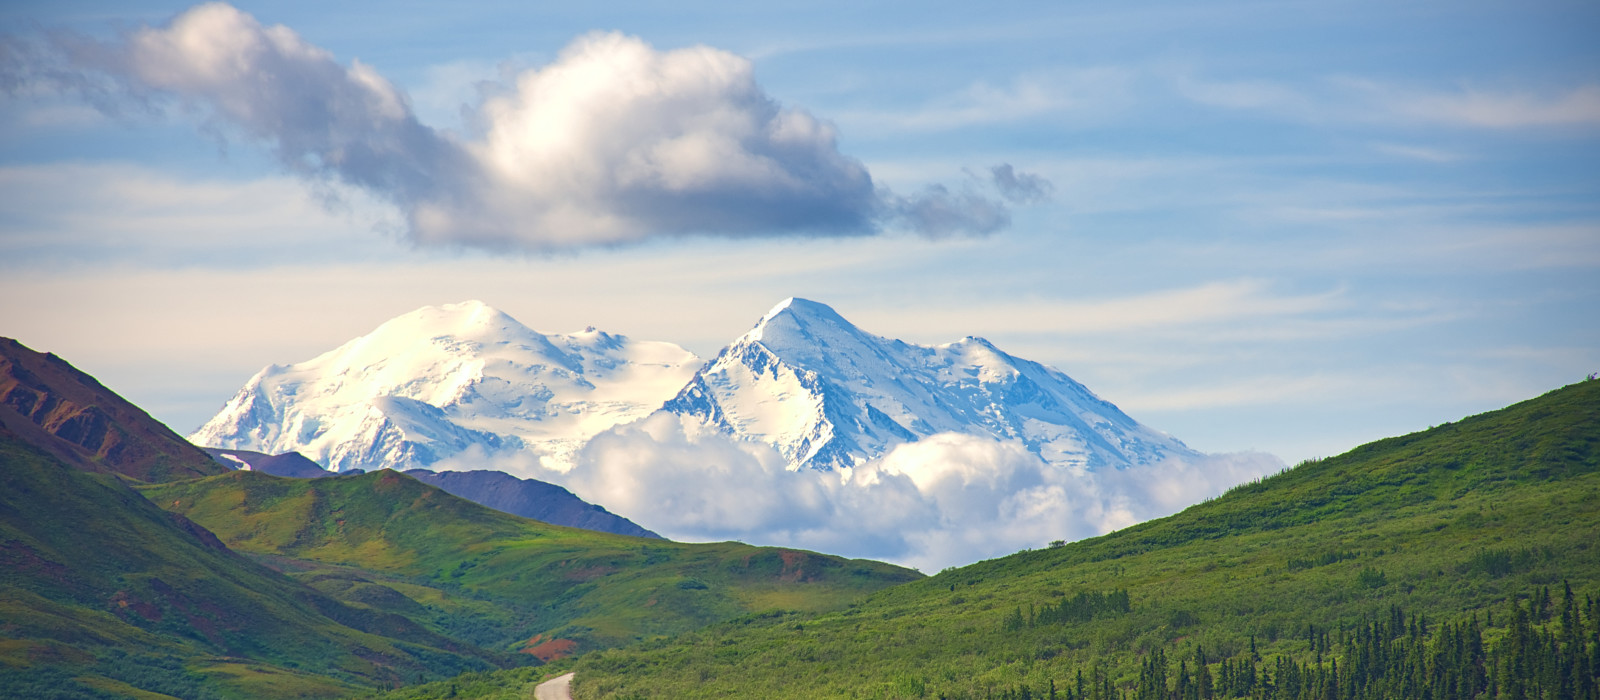 Reiseziel Denali Nationalpark Alaska